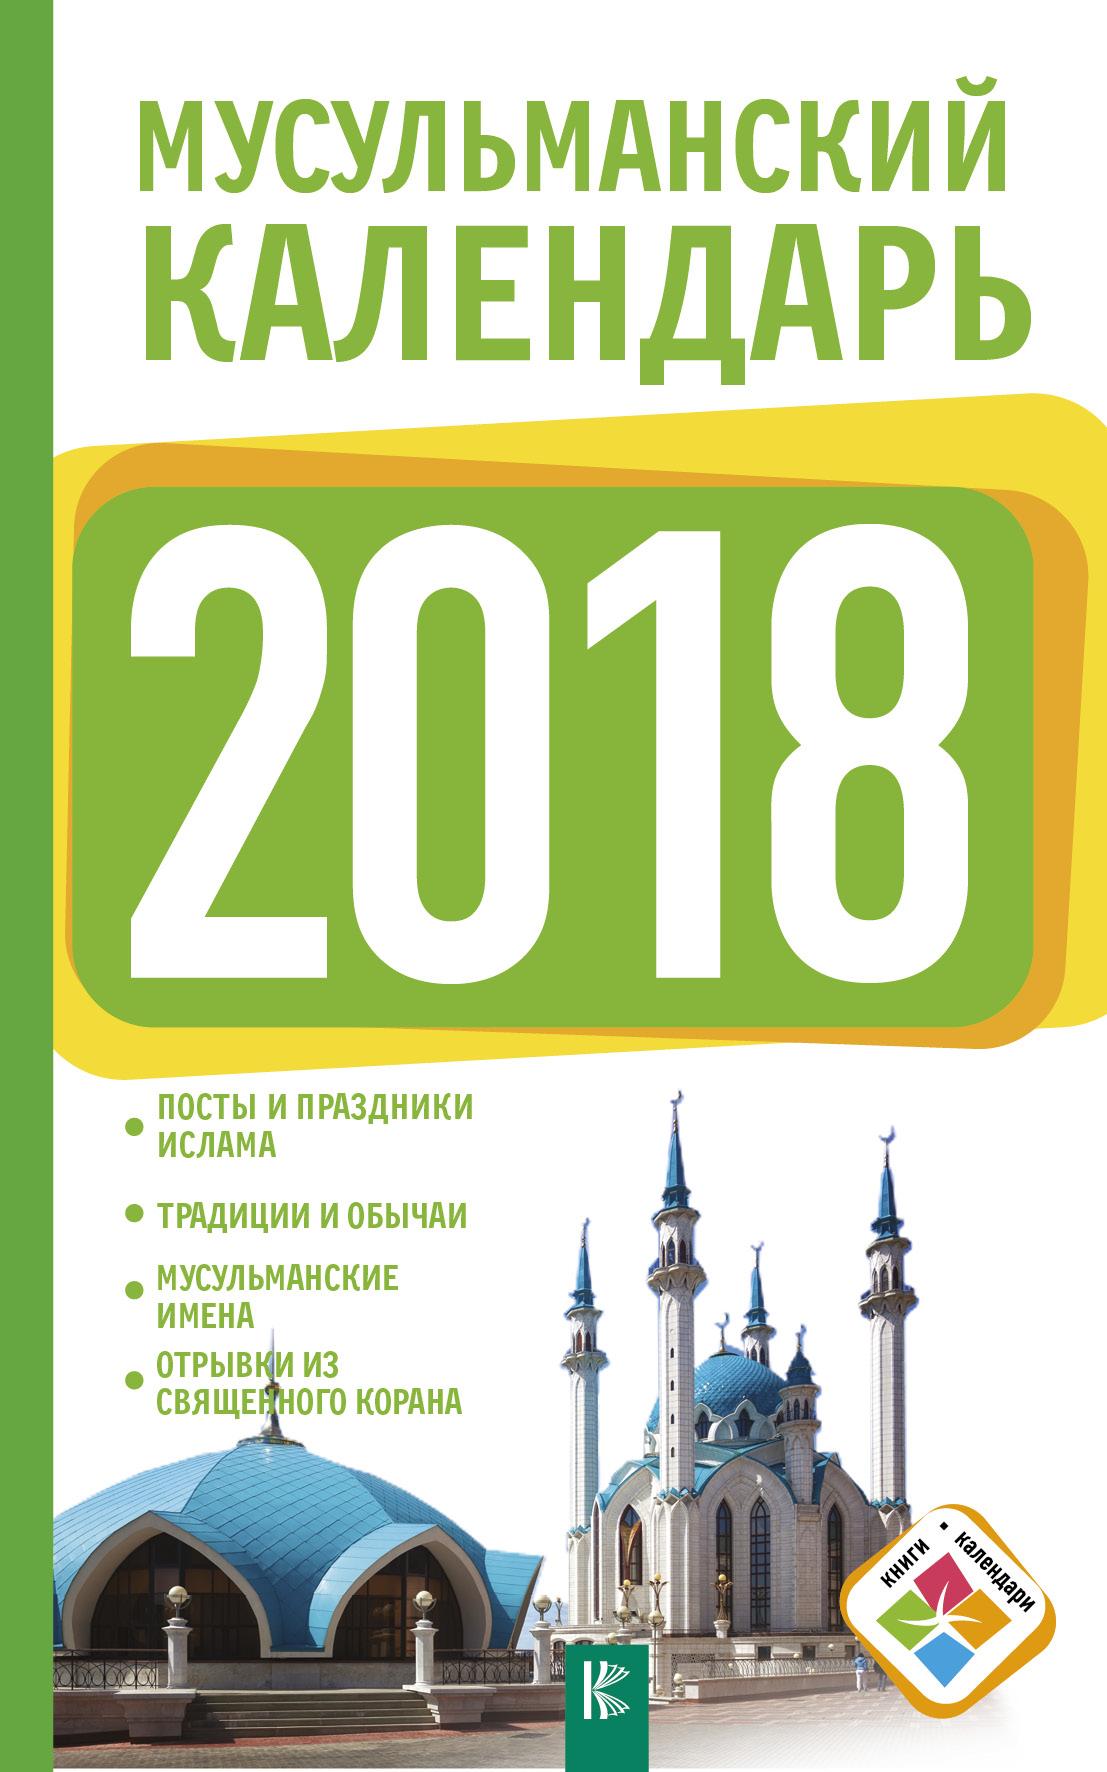 Мусульманский календарь на 2018 год ( Хорсанд Д.В.  )